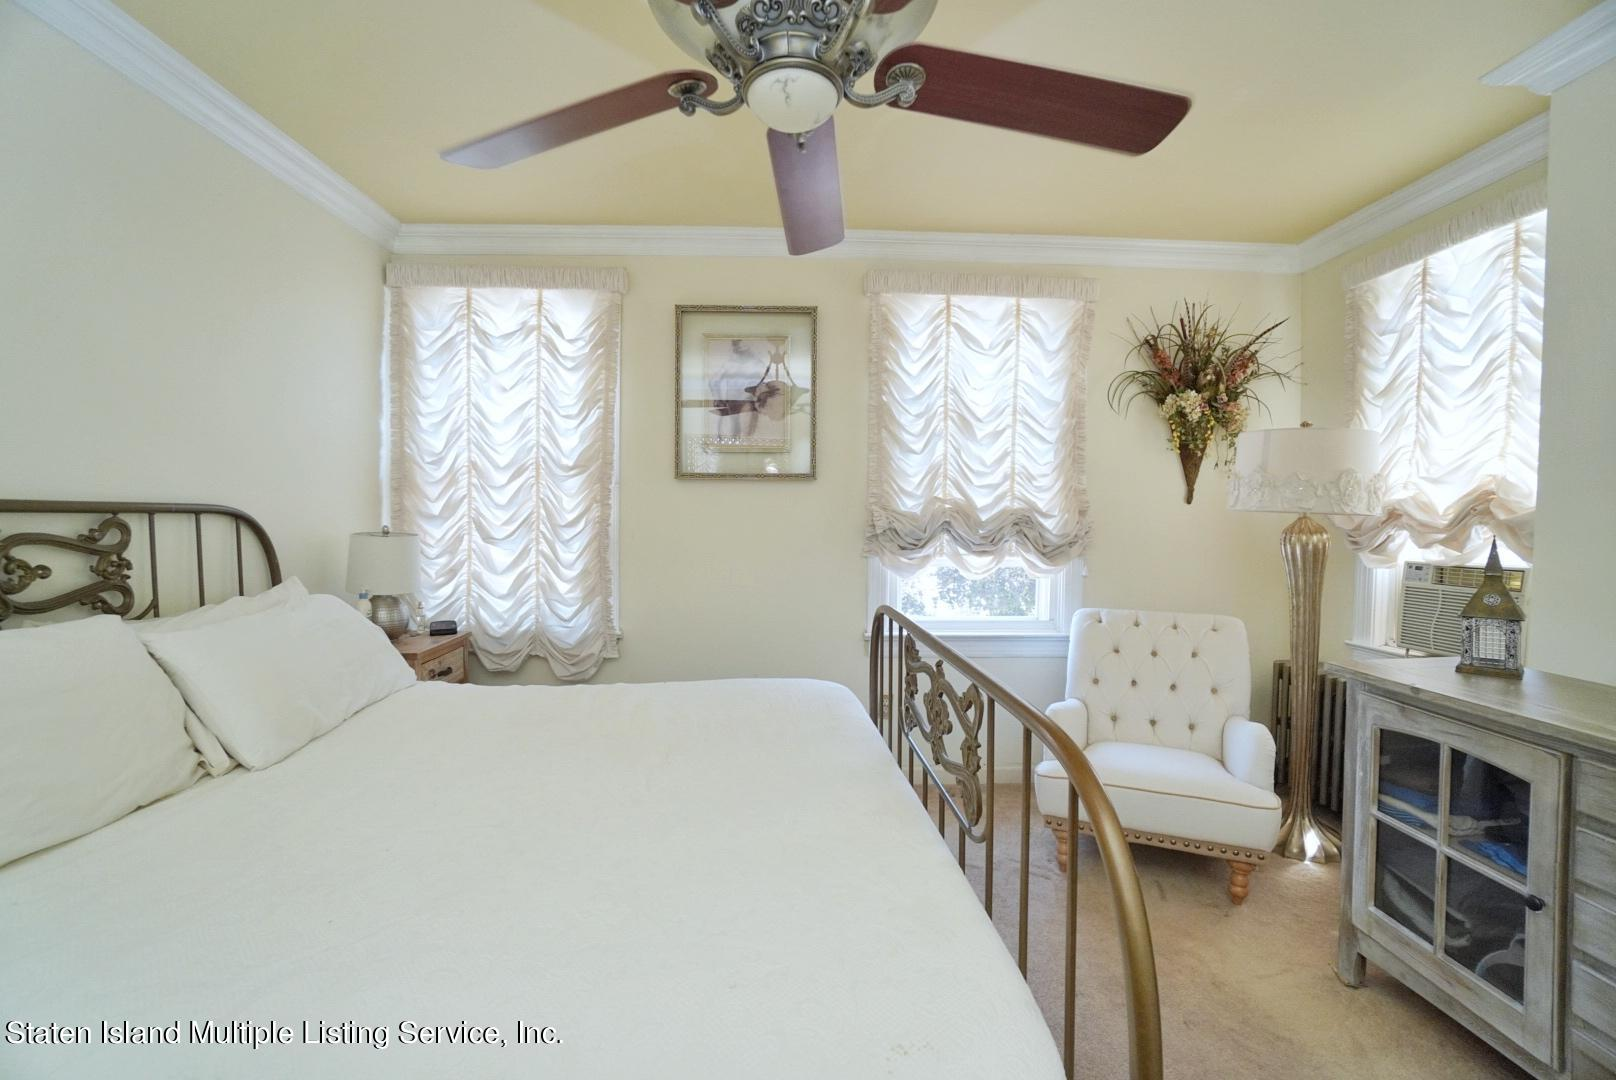 Single Family - Detached 264 Fisher Avenue  Staten Island, NY 10307, MLS-1146898-30